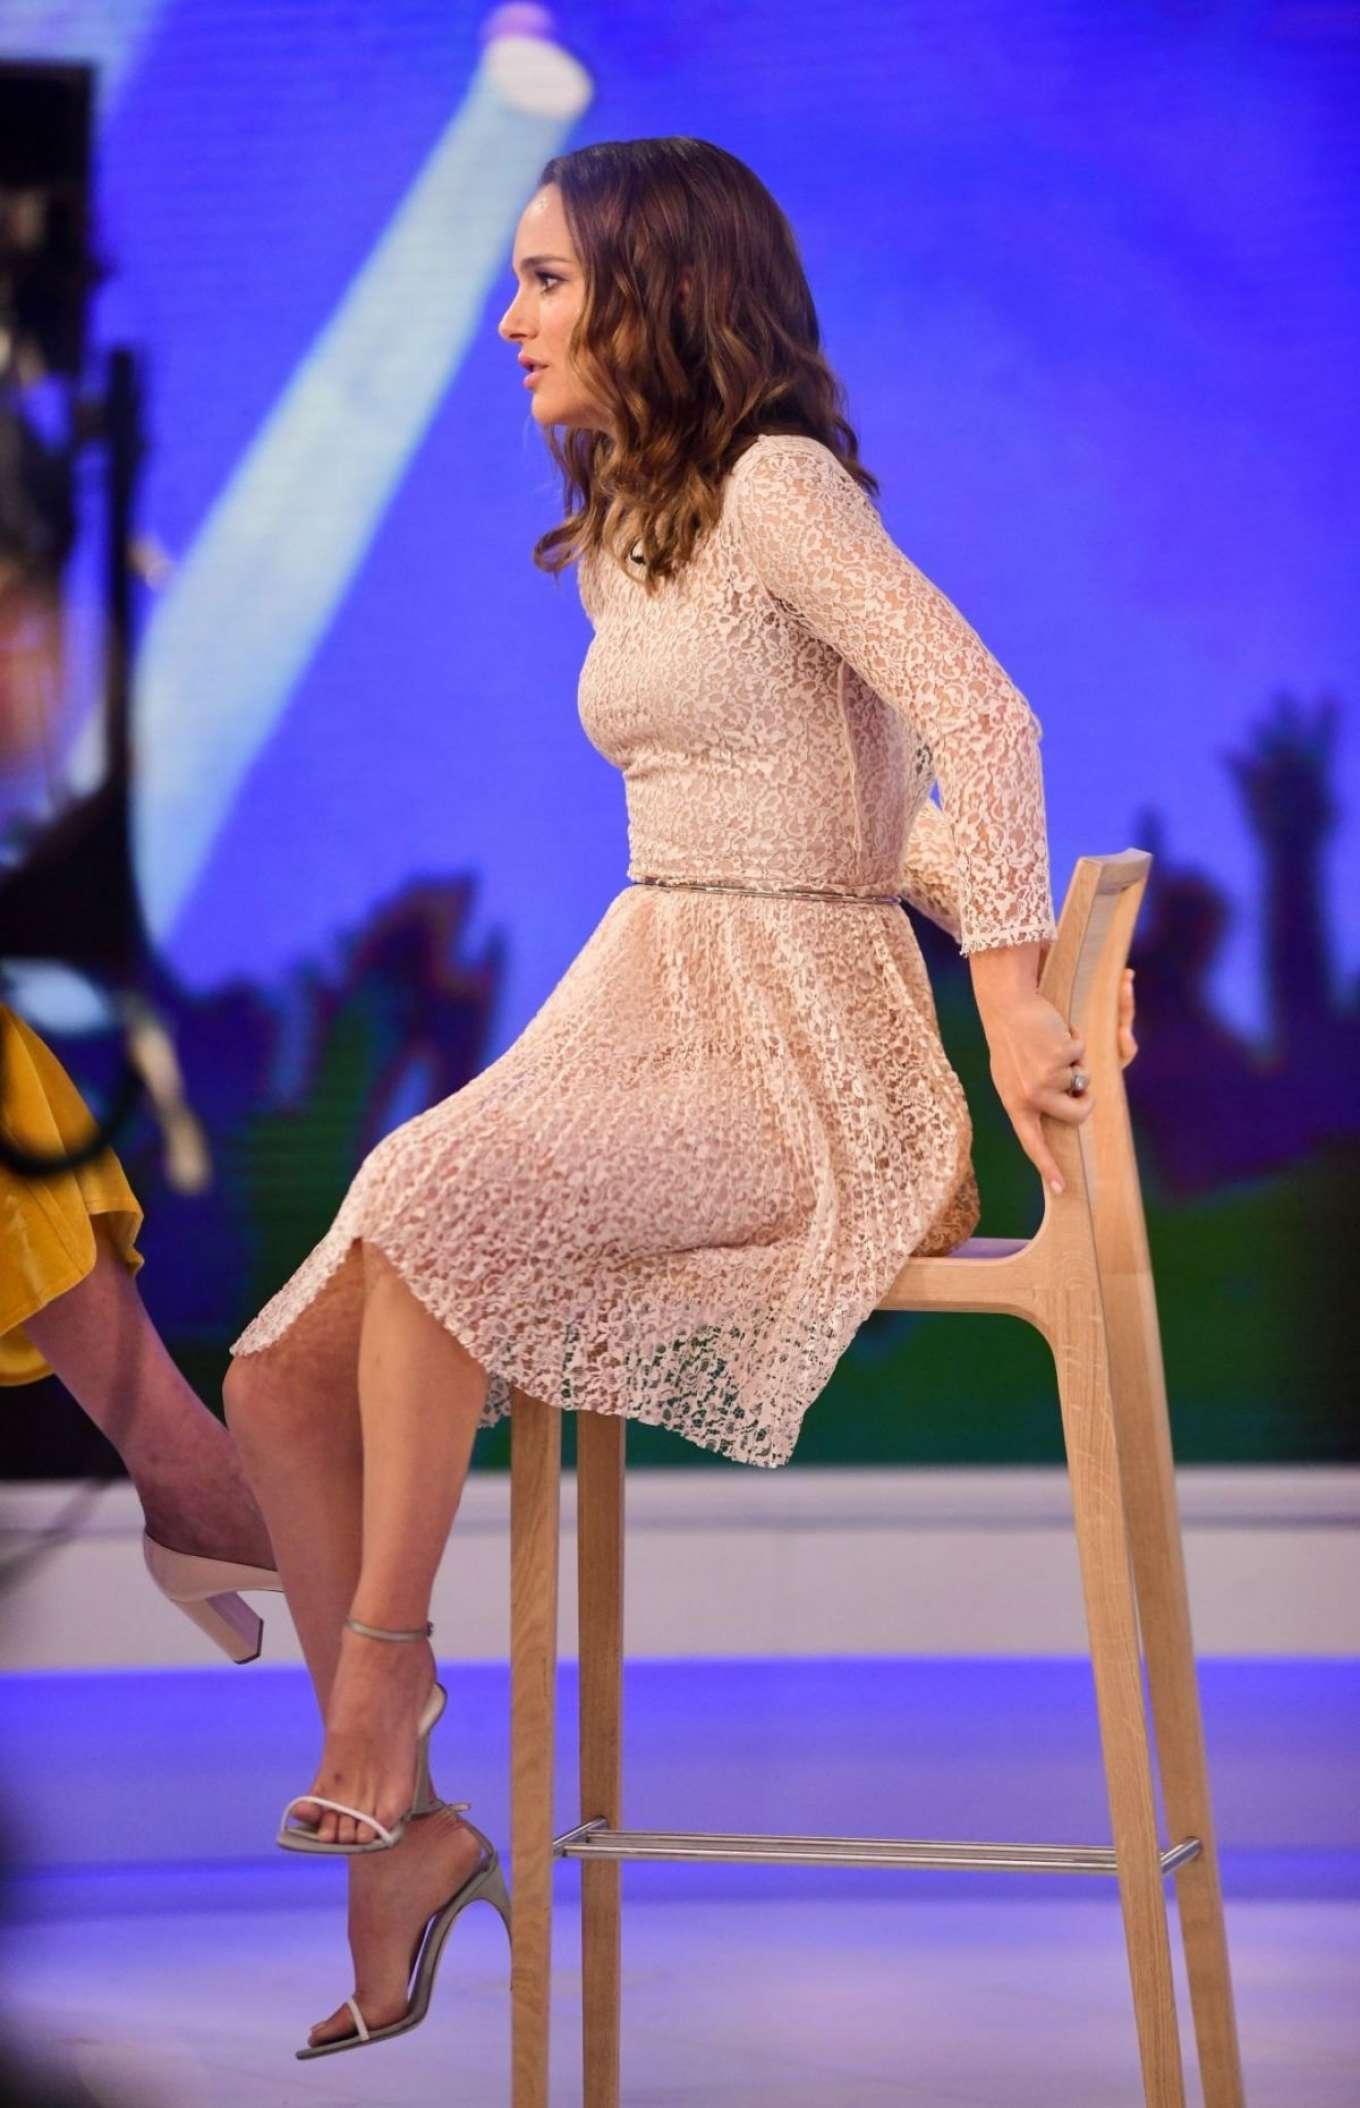 Natalie Portman 2018 : Natalie Portman: On Today Show -07